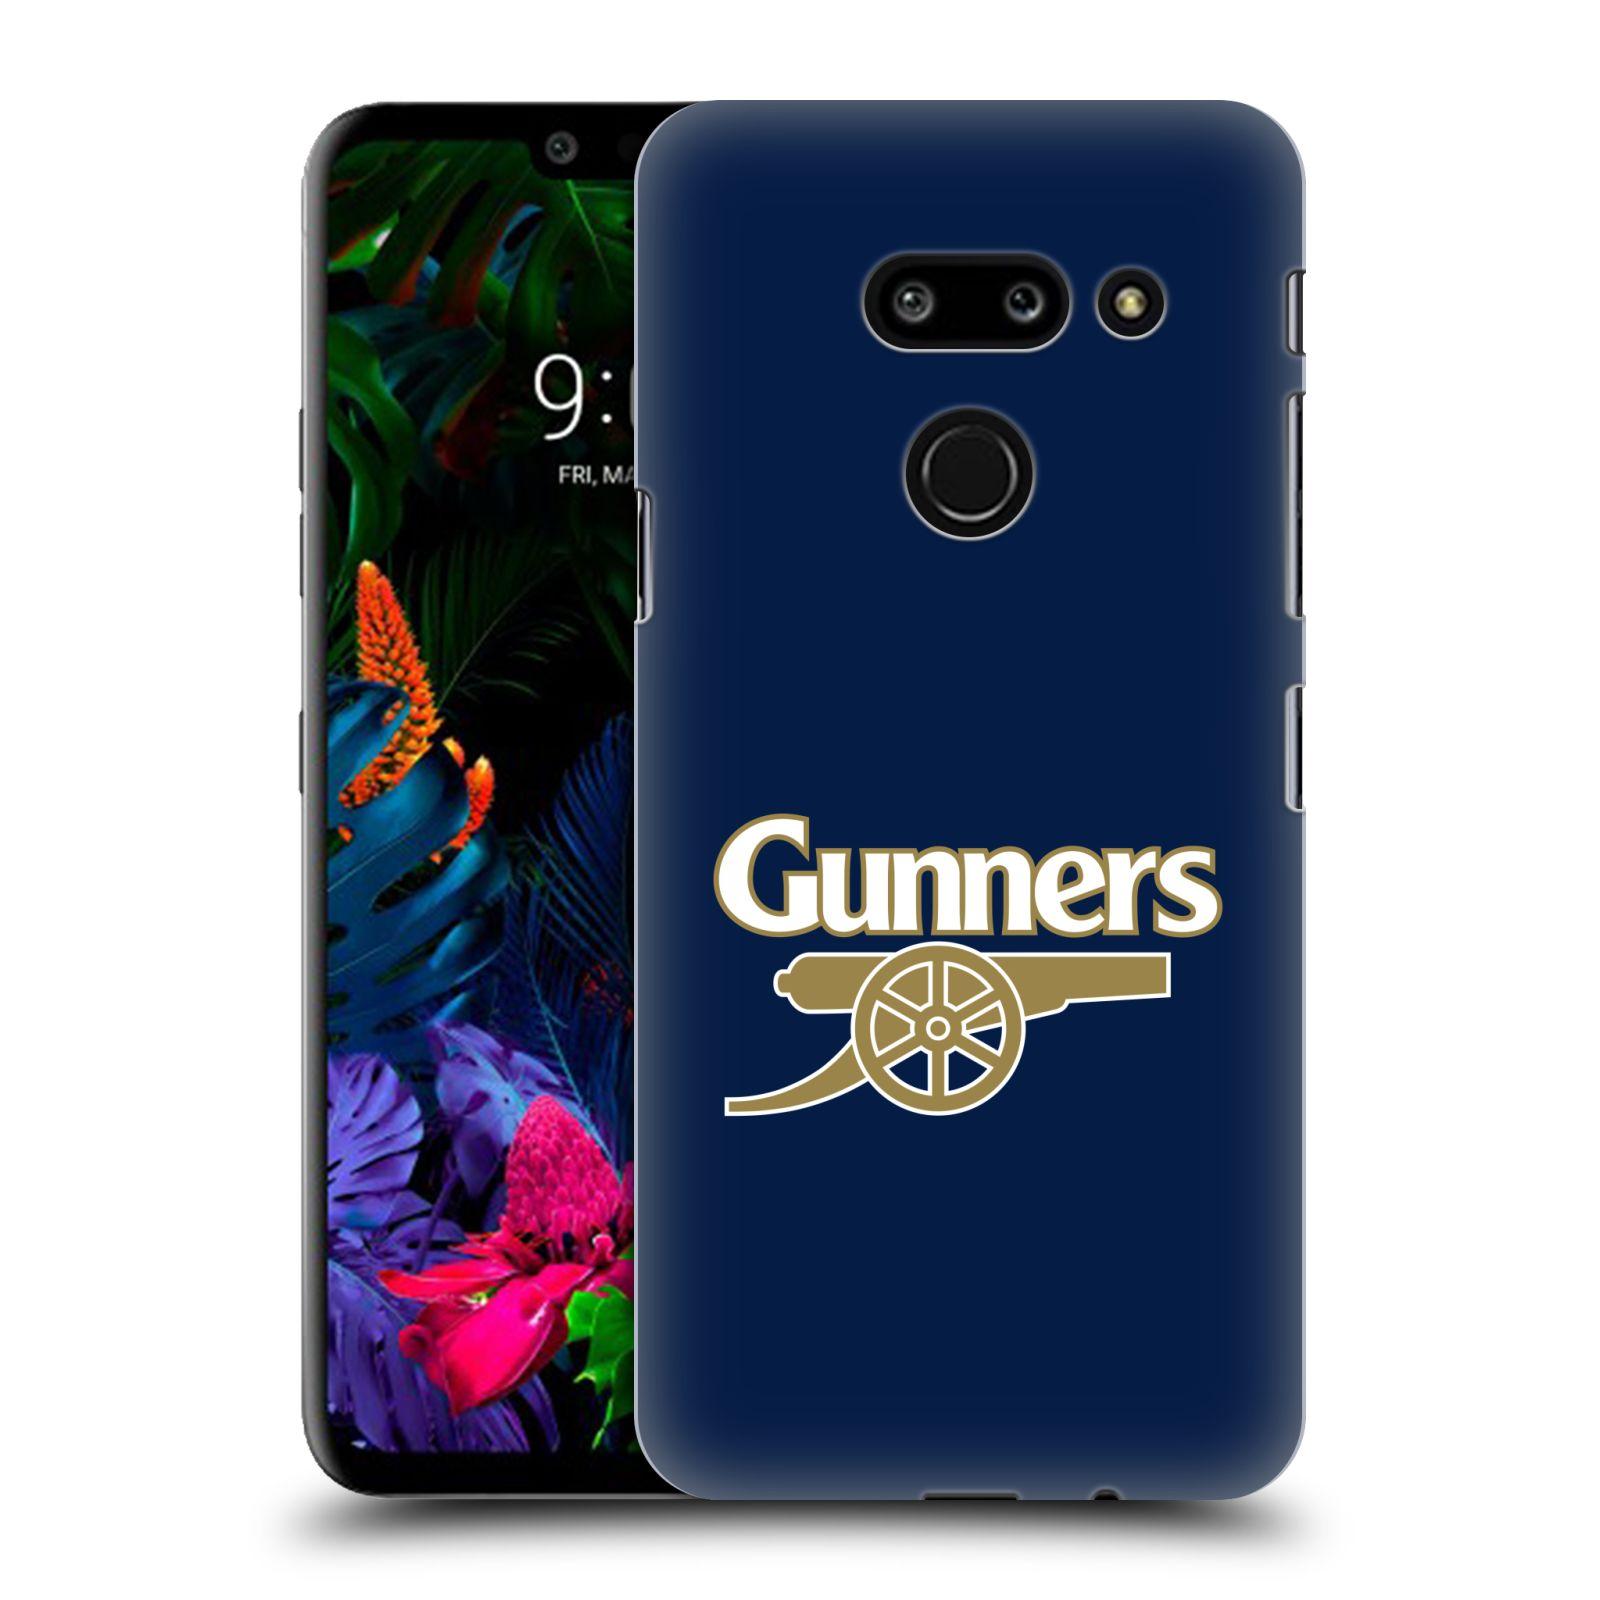 Plastové pouzdro na mobil LG G8 ThinQ - Head Case - Arsenal FC - Gunners